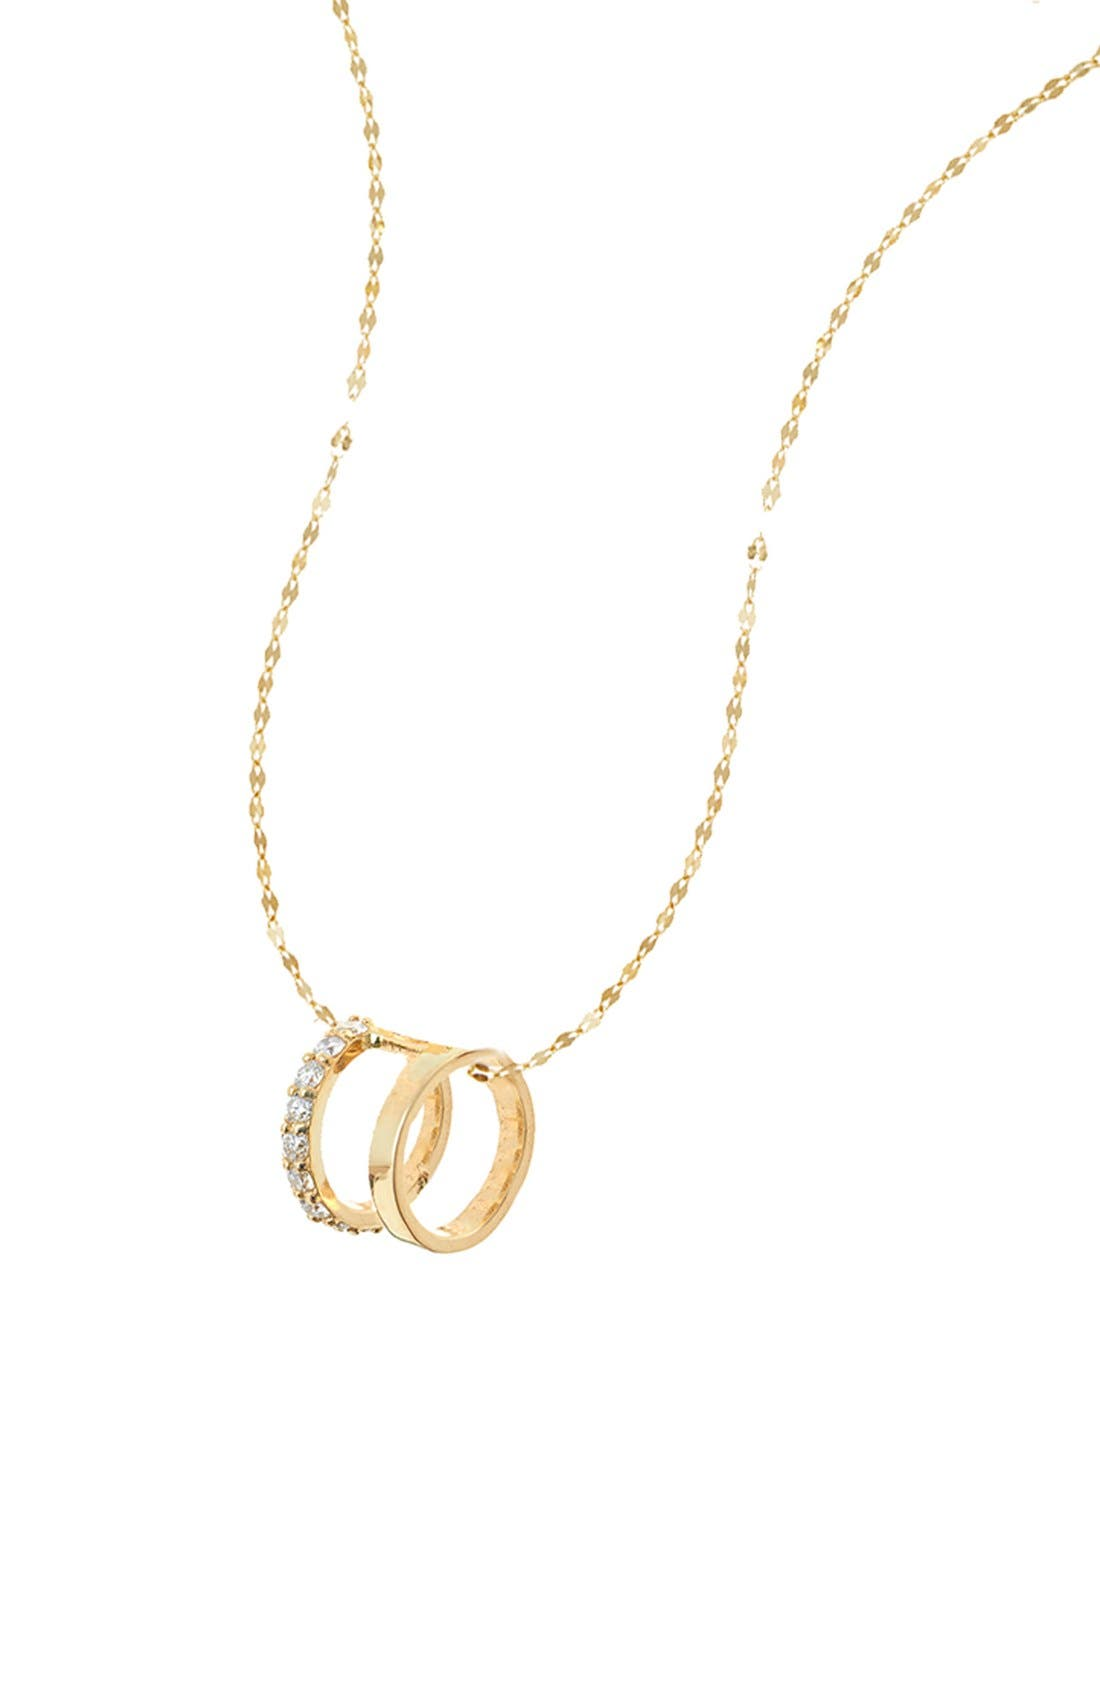 Main Image - Lana Jewelry 'Flawless Dare' Pendant Necklace